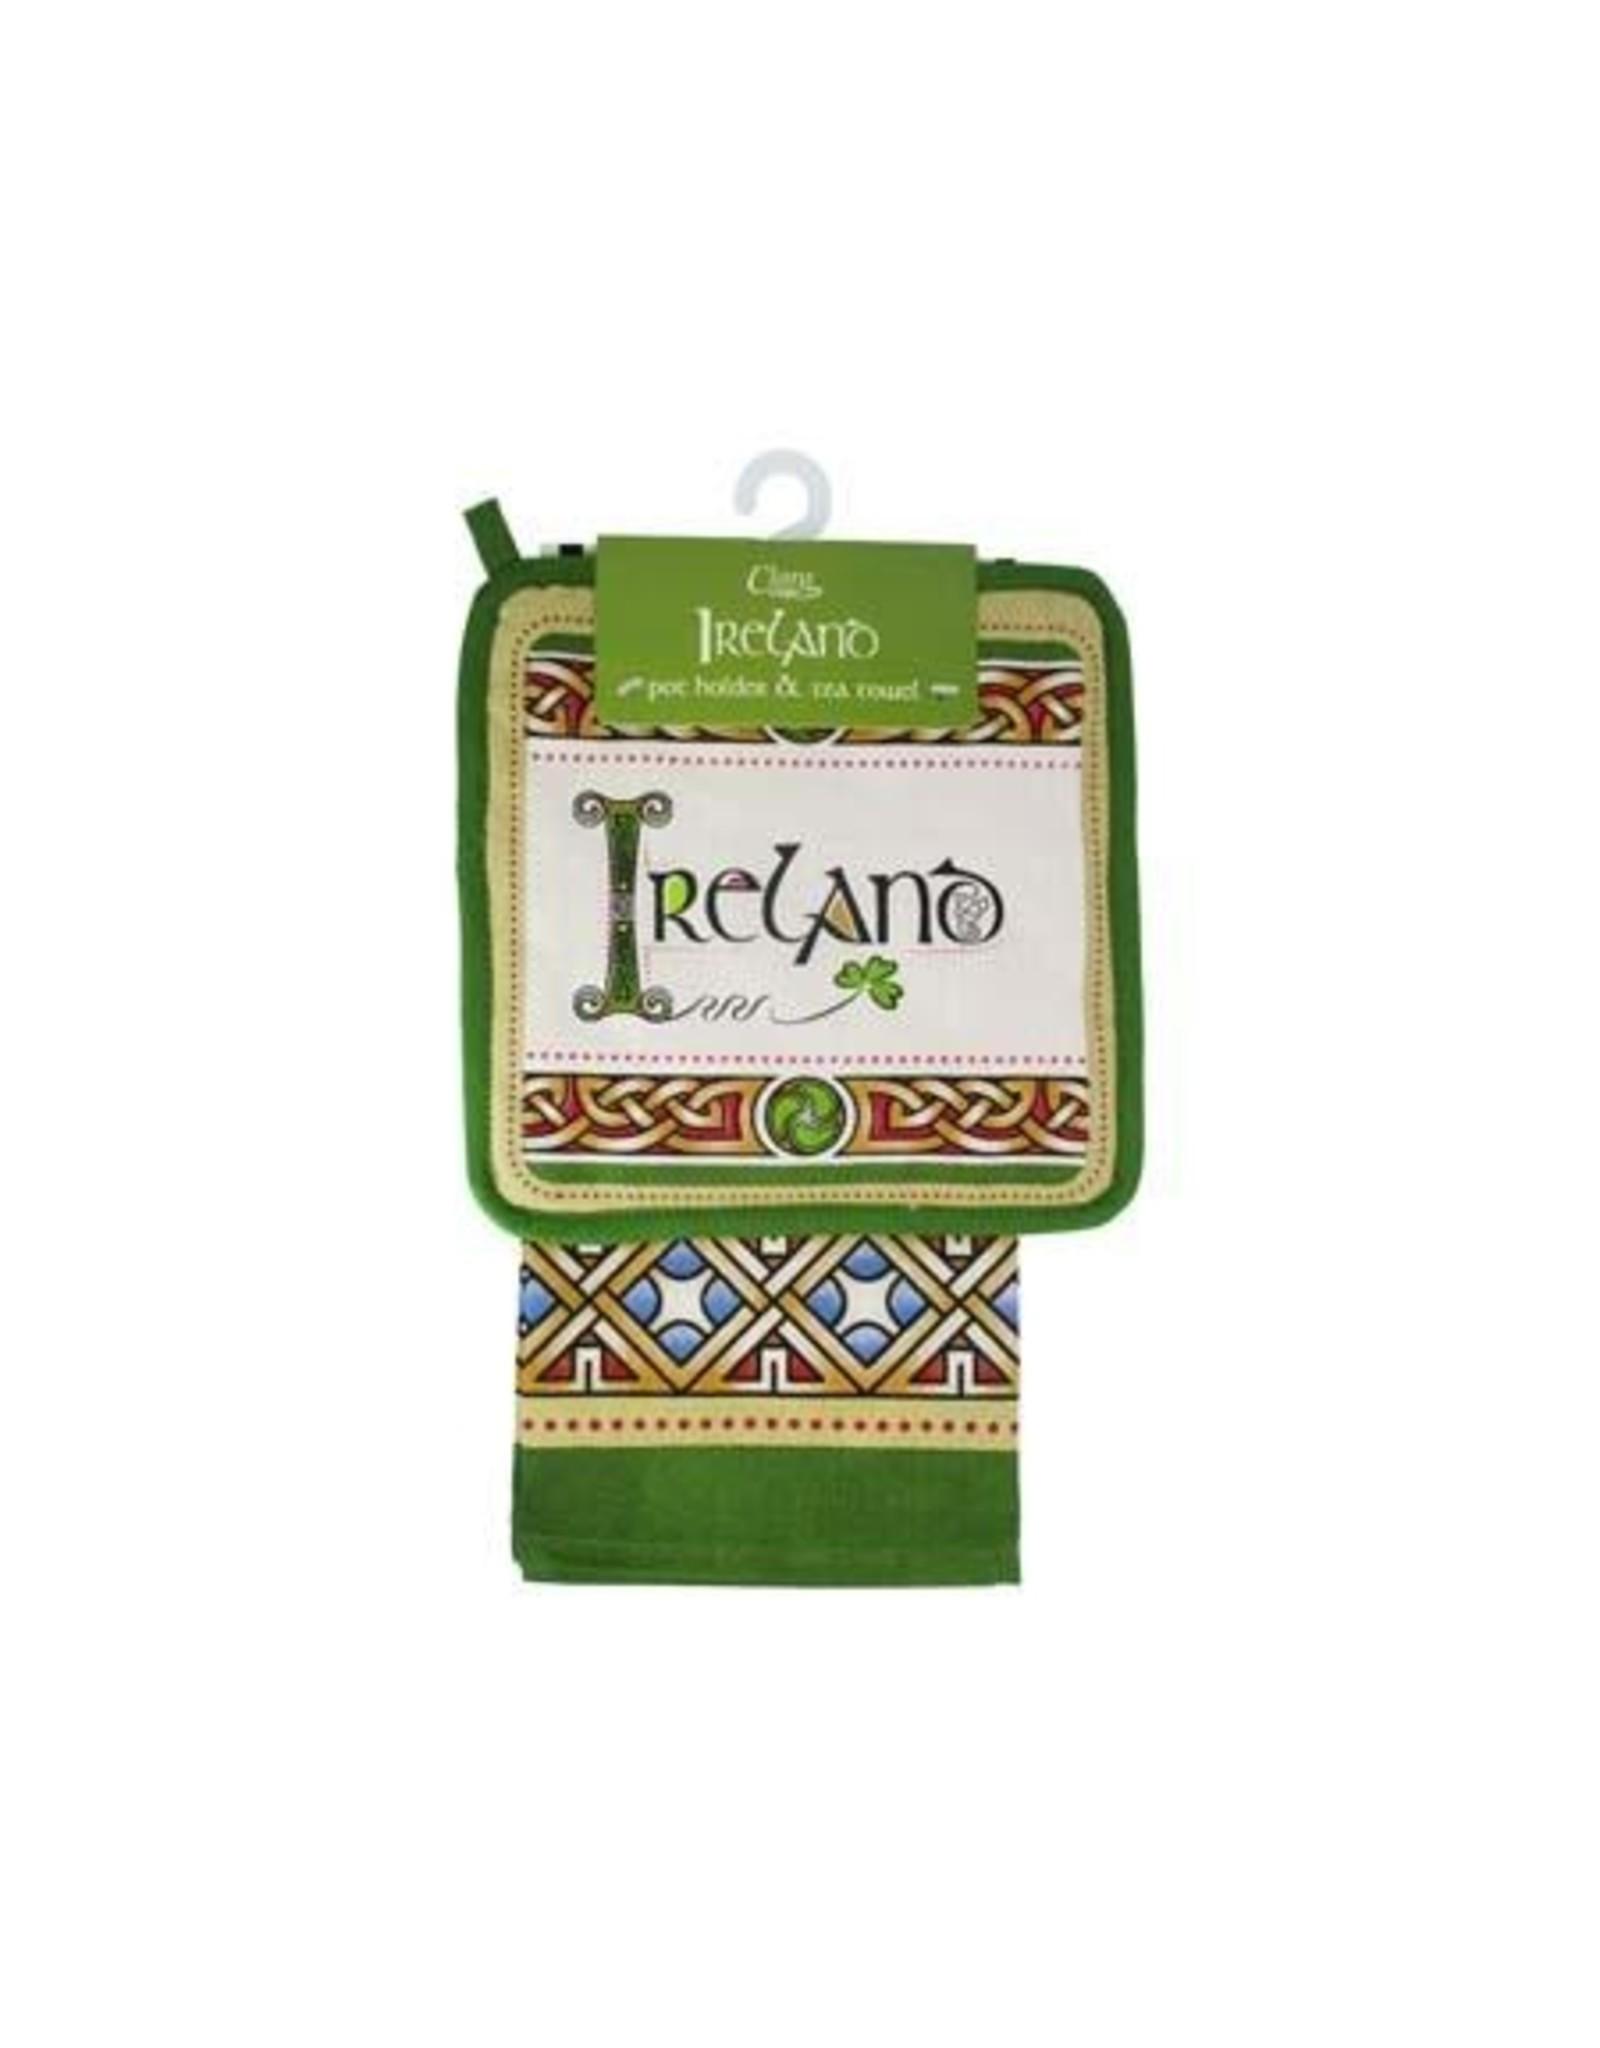 Royal Tara Ireland Cream/Grn Pot Holder + Tea Towel